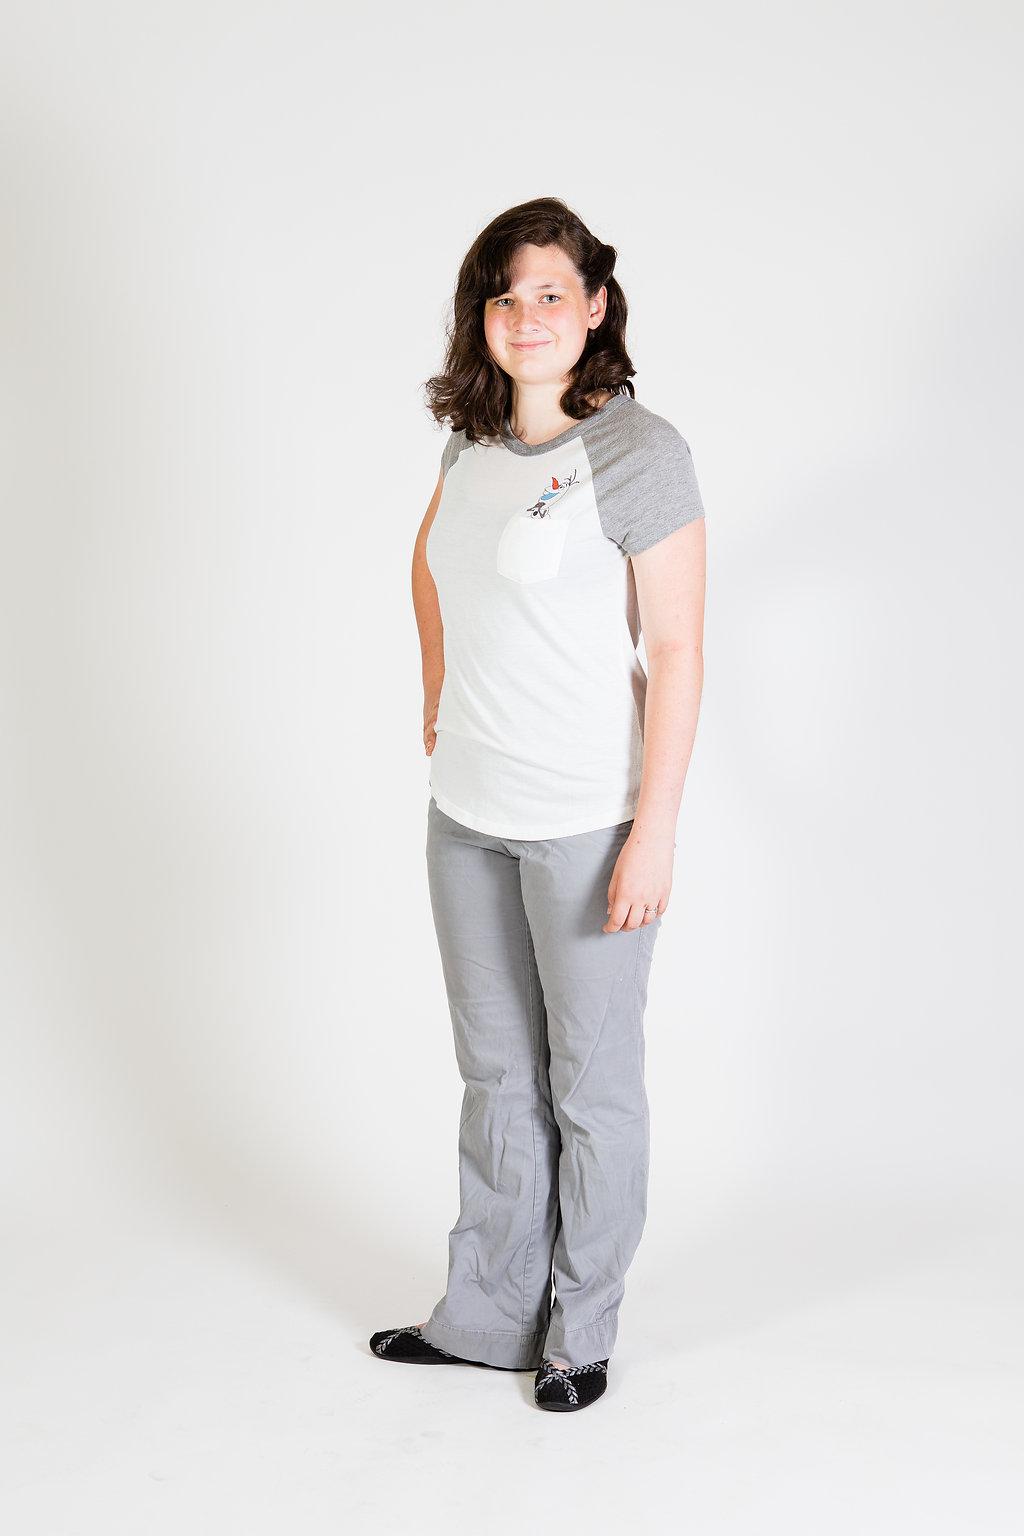 16JuneWCA_Uniforms154-Edit.jpg